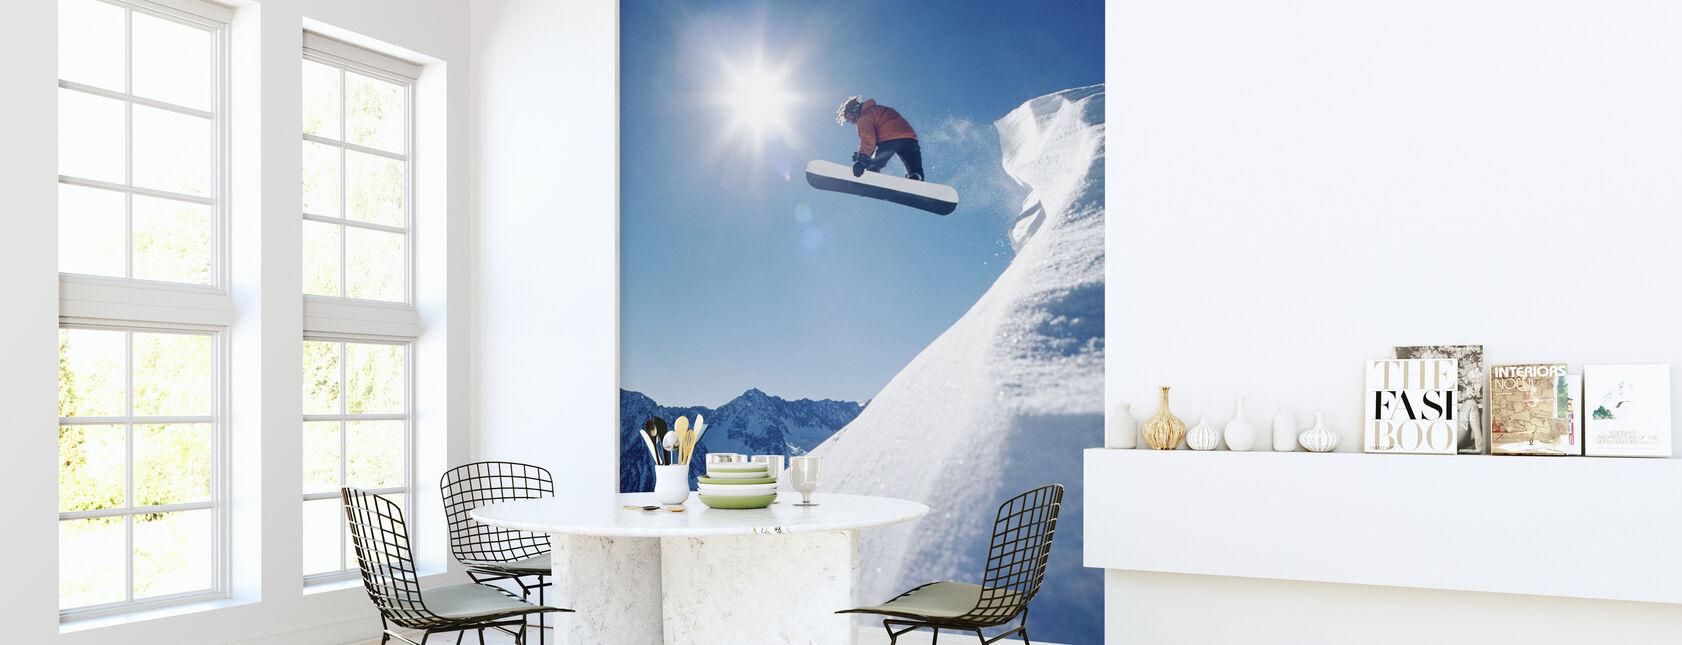 Snowboard Grab - Wallpaper - Kitchen